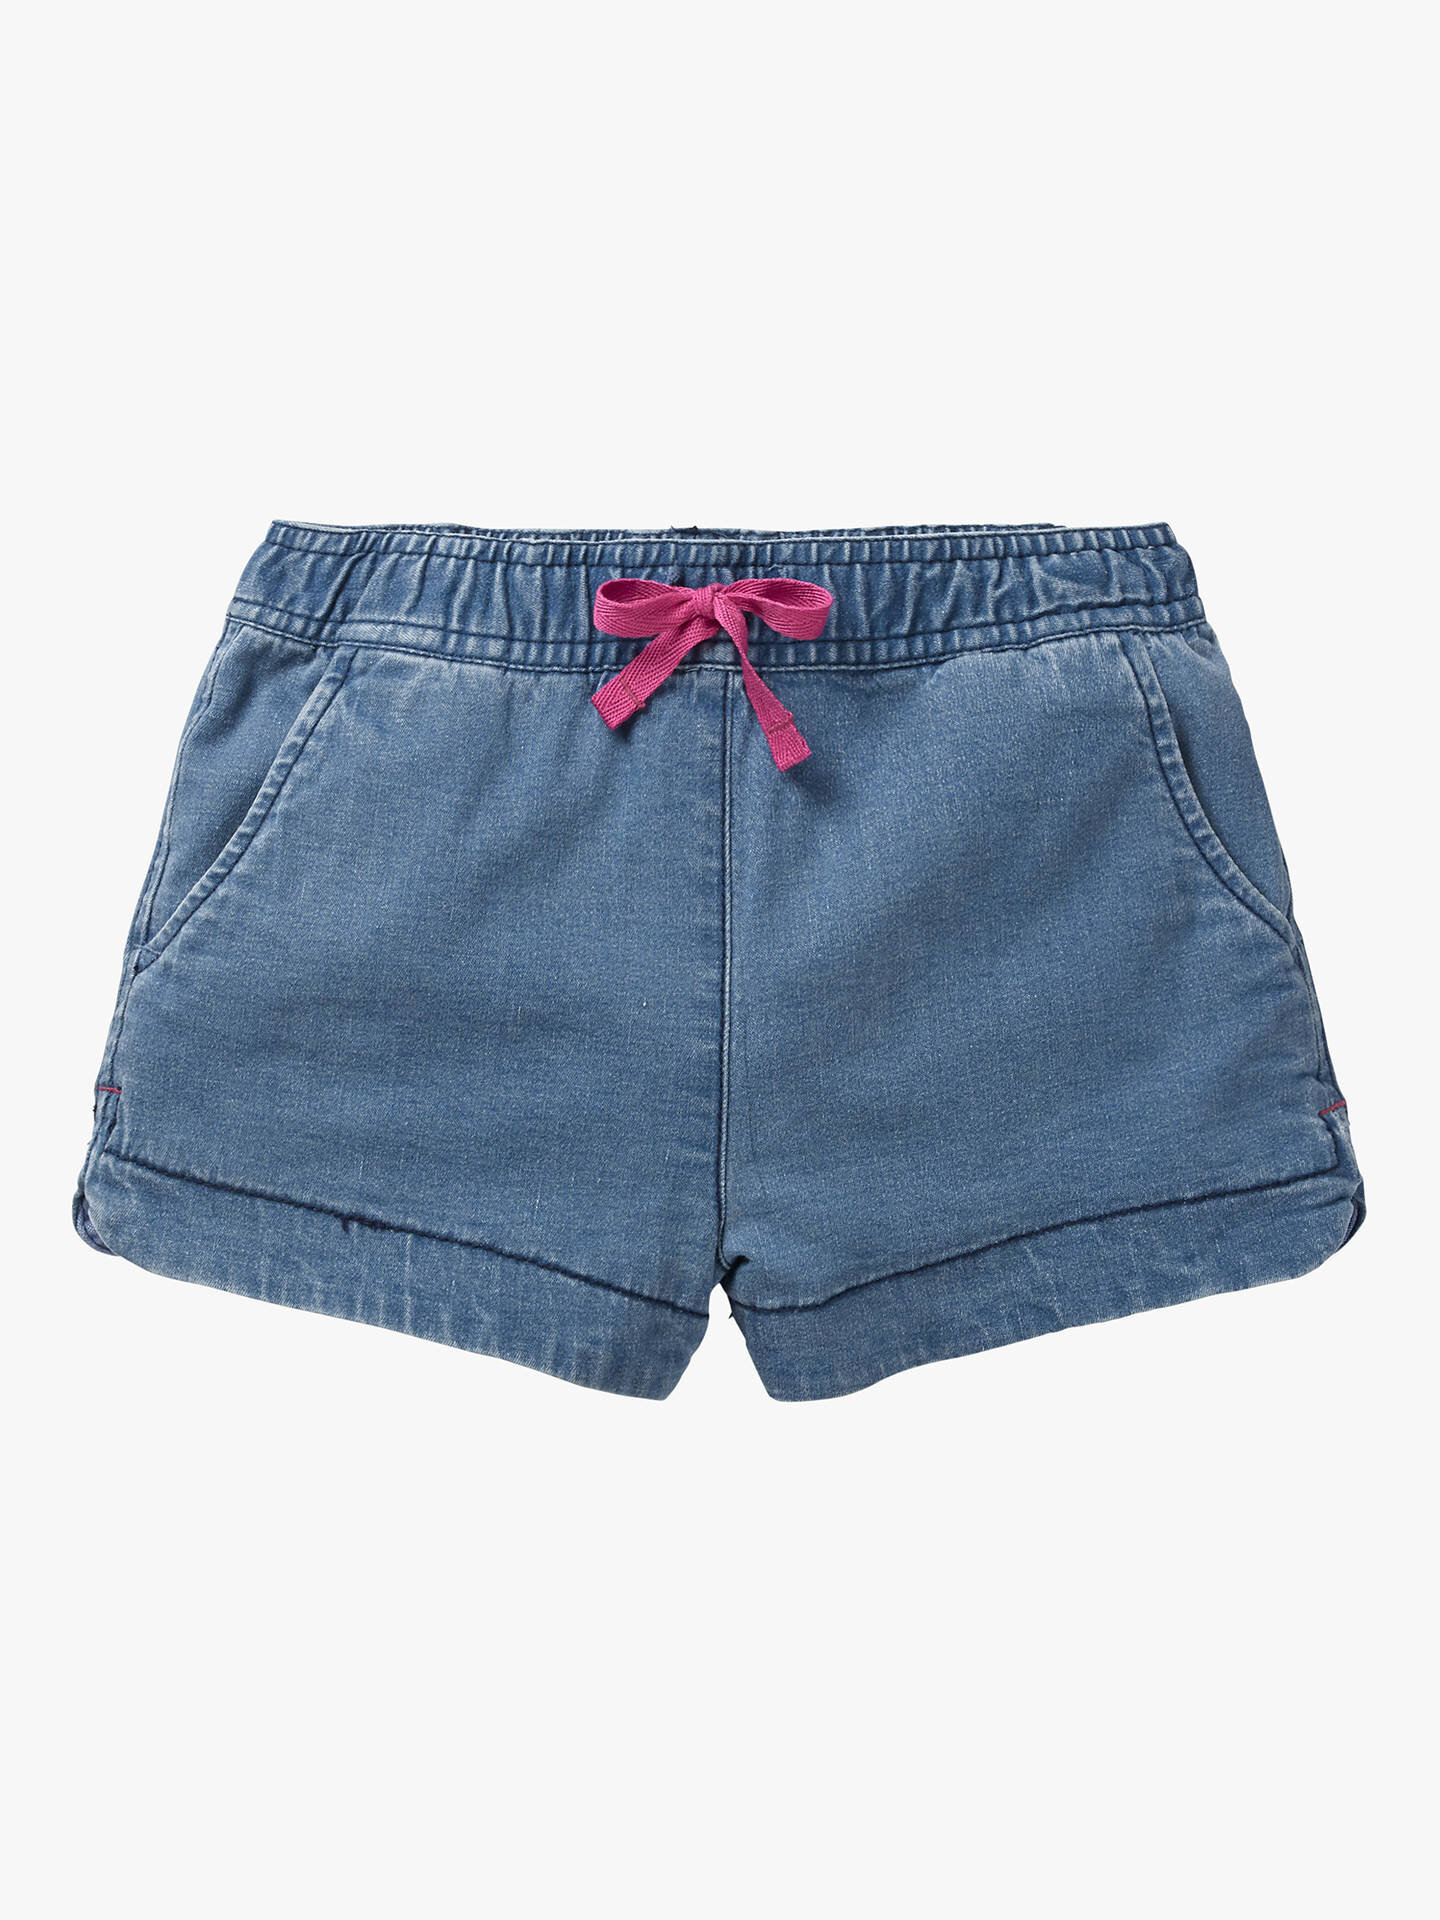 Mini Boden Heart Pocket Shorts in Chambray Blue.jpg